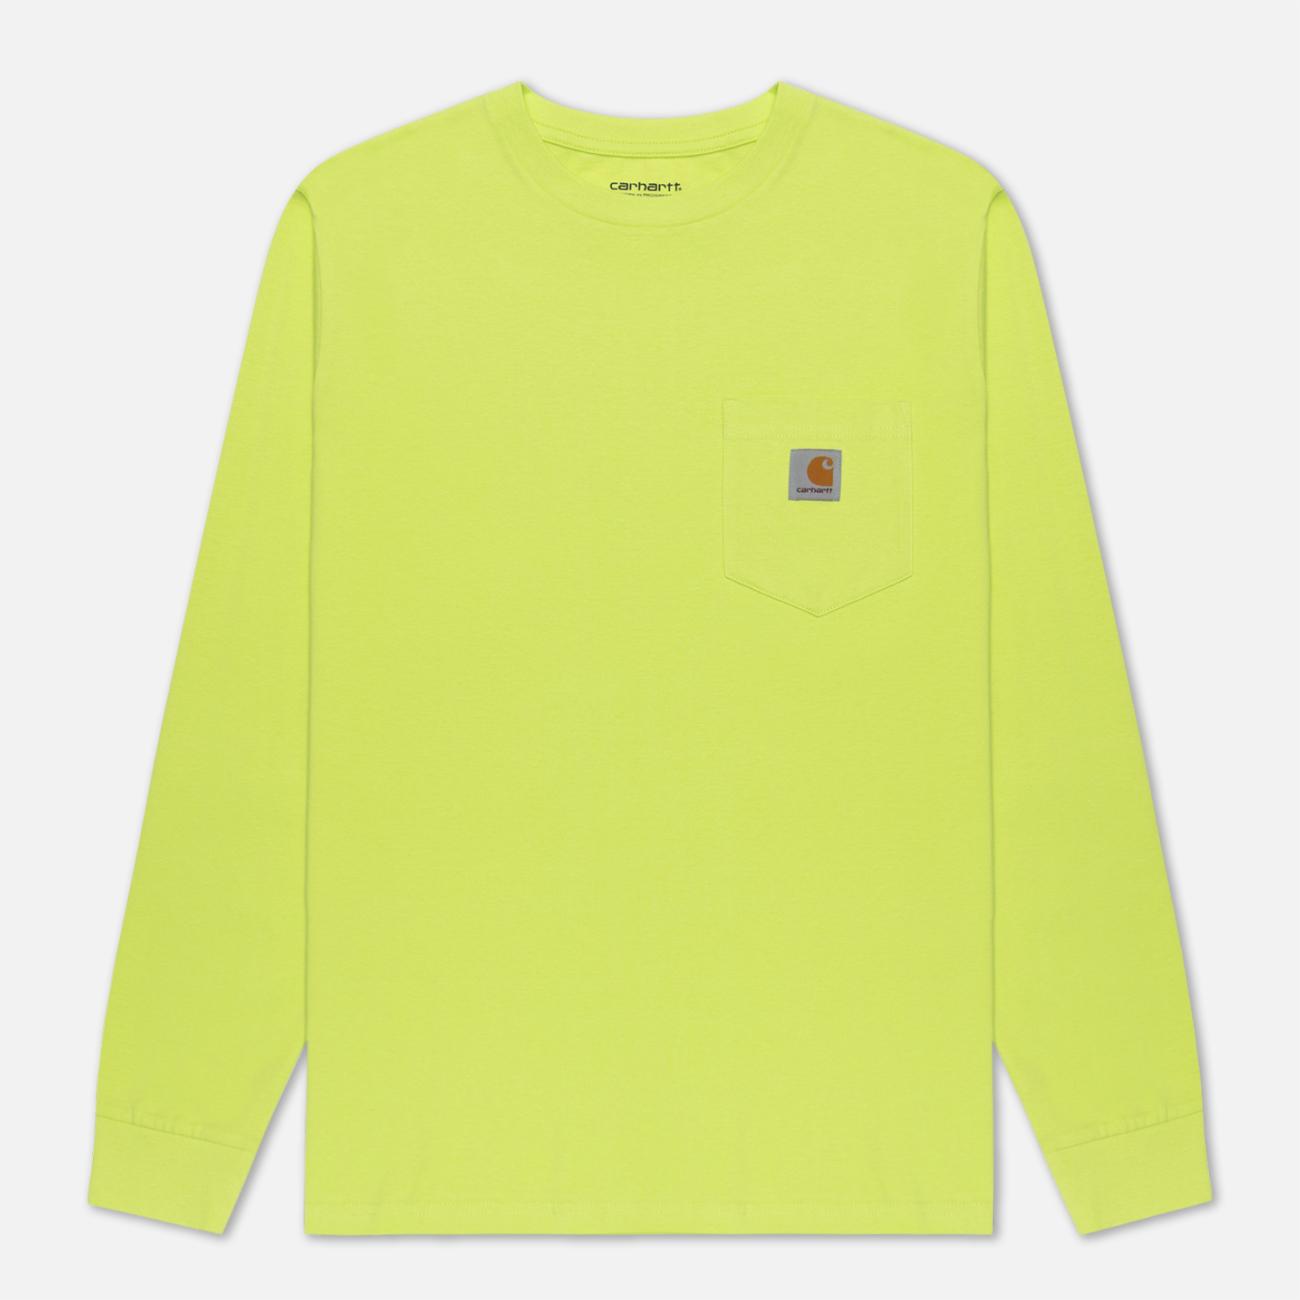 Мужской лонгслив Carhartt WIP L/S Pocket Lime